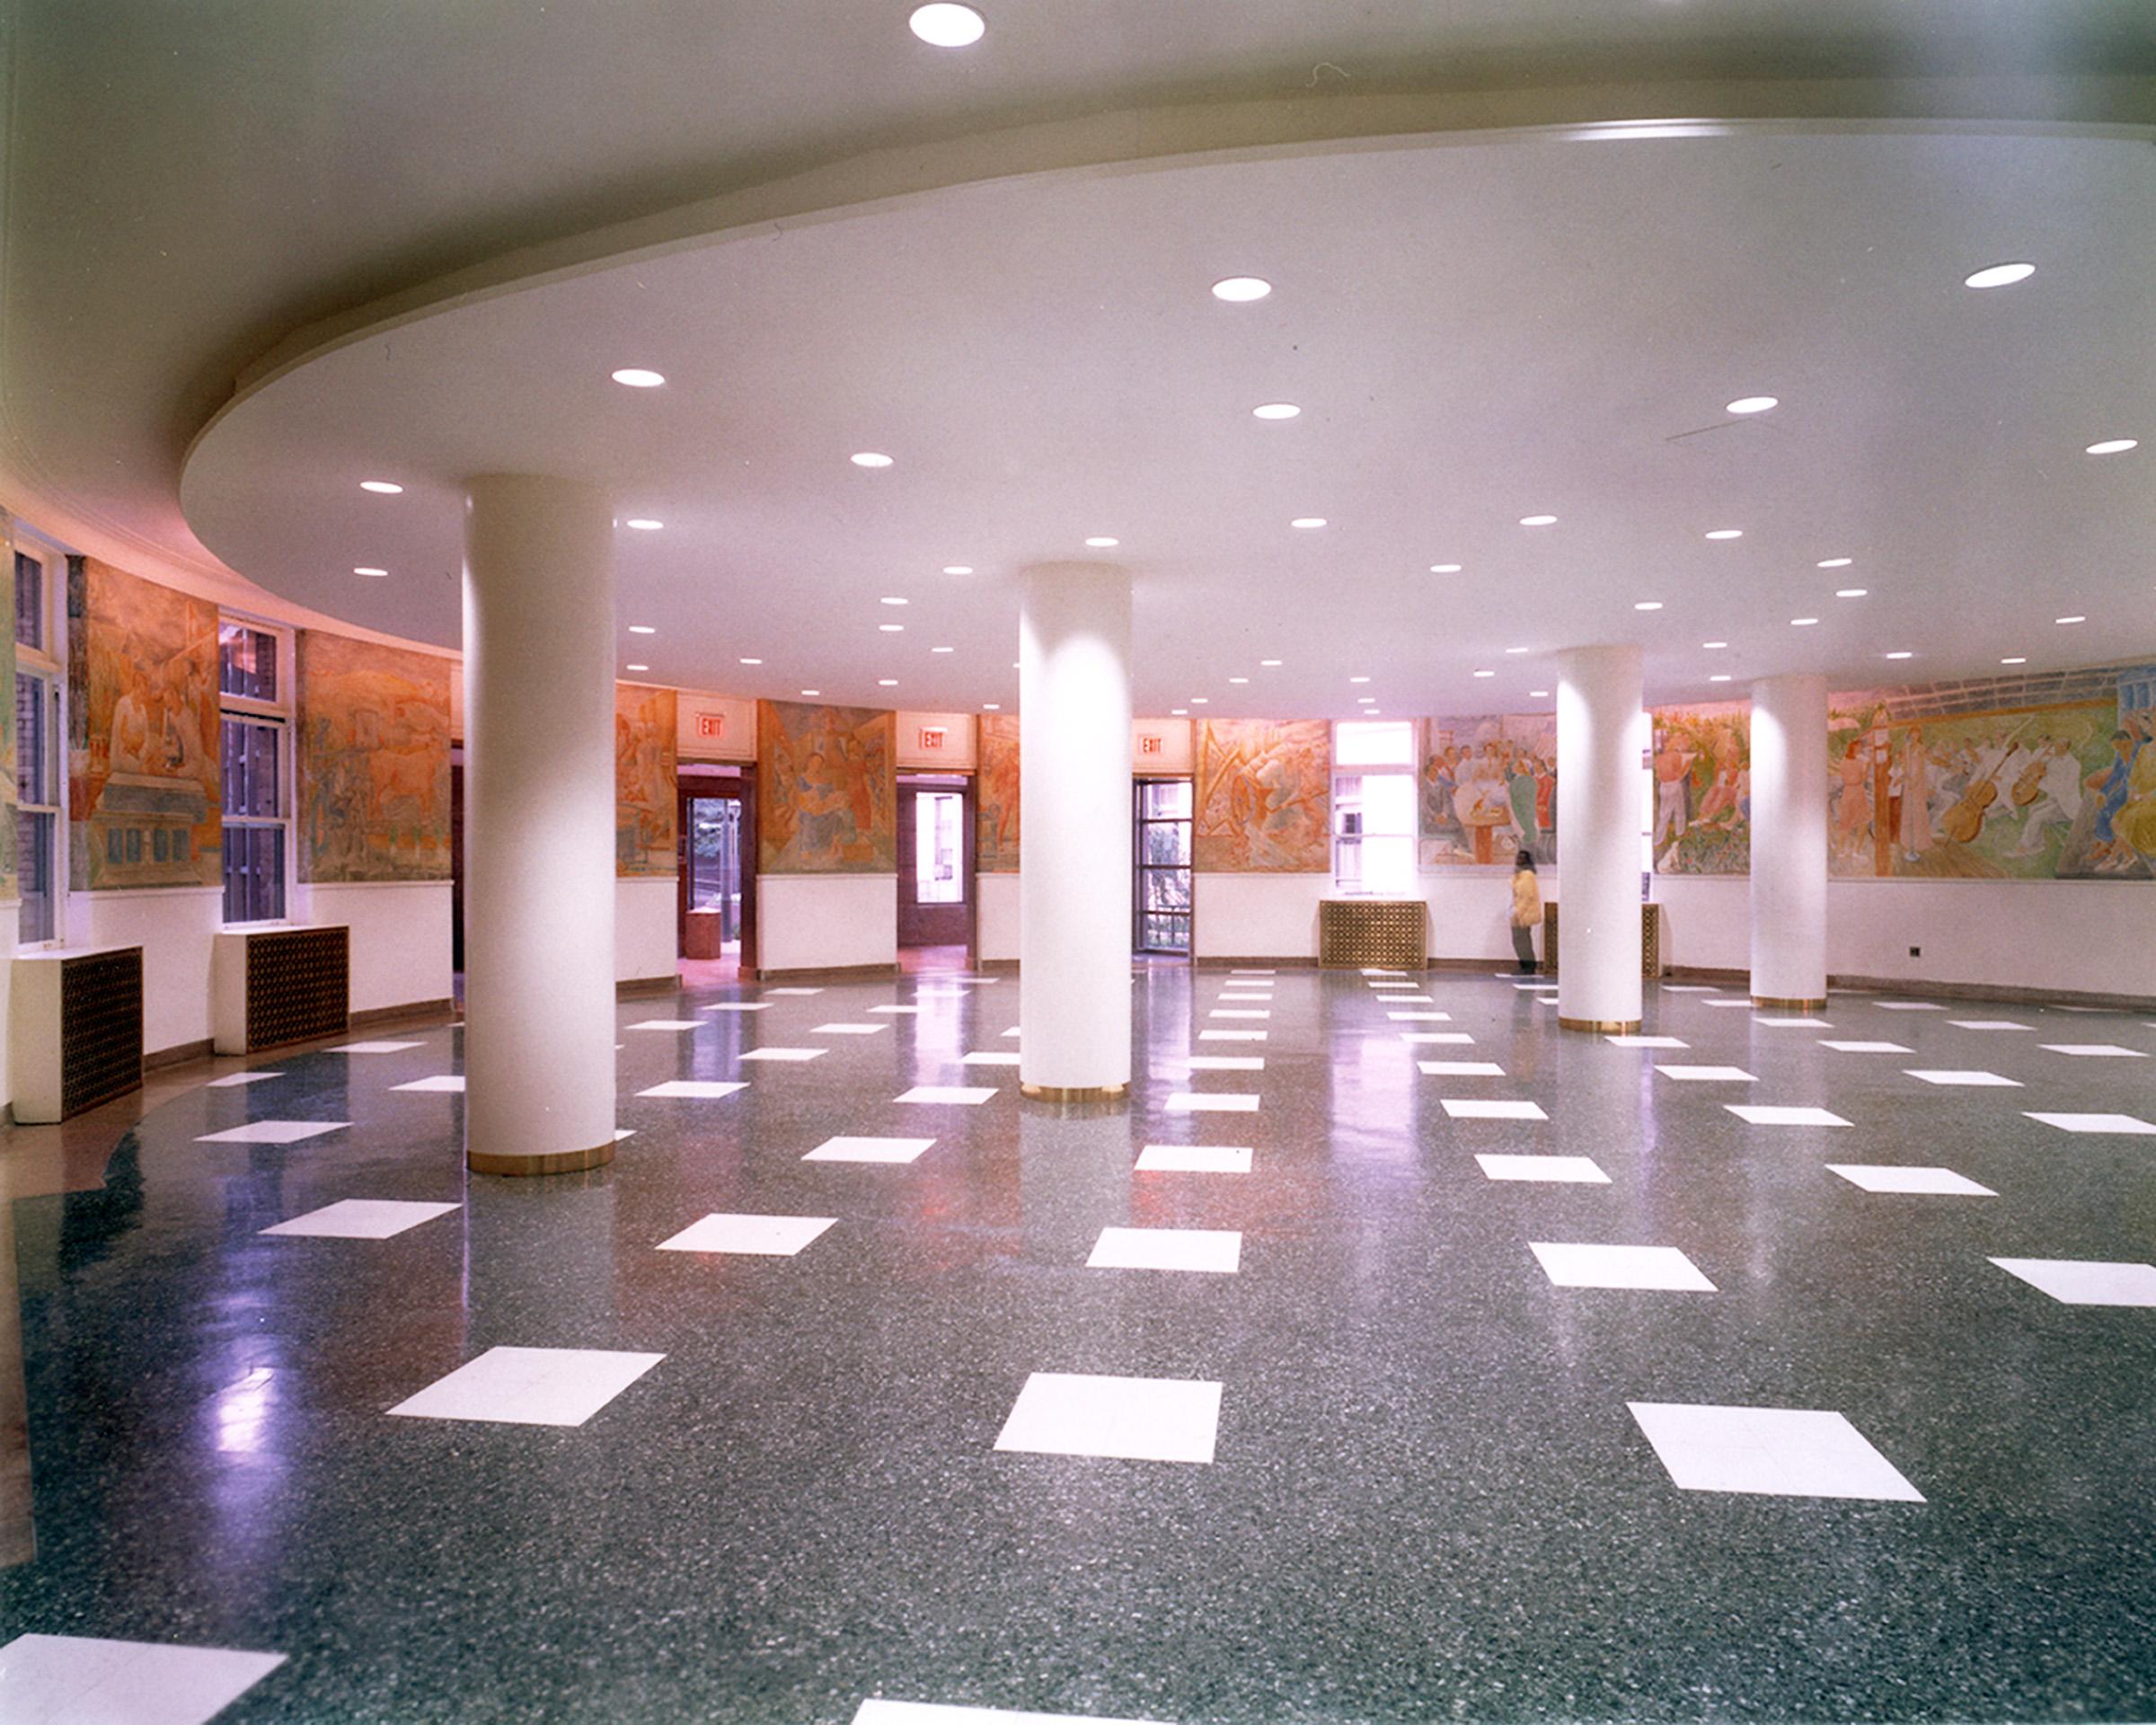 BH - New Entrance Lobby - Interior View 1.jpg